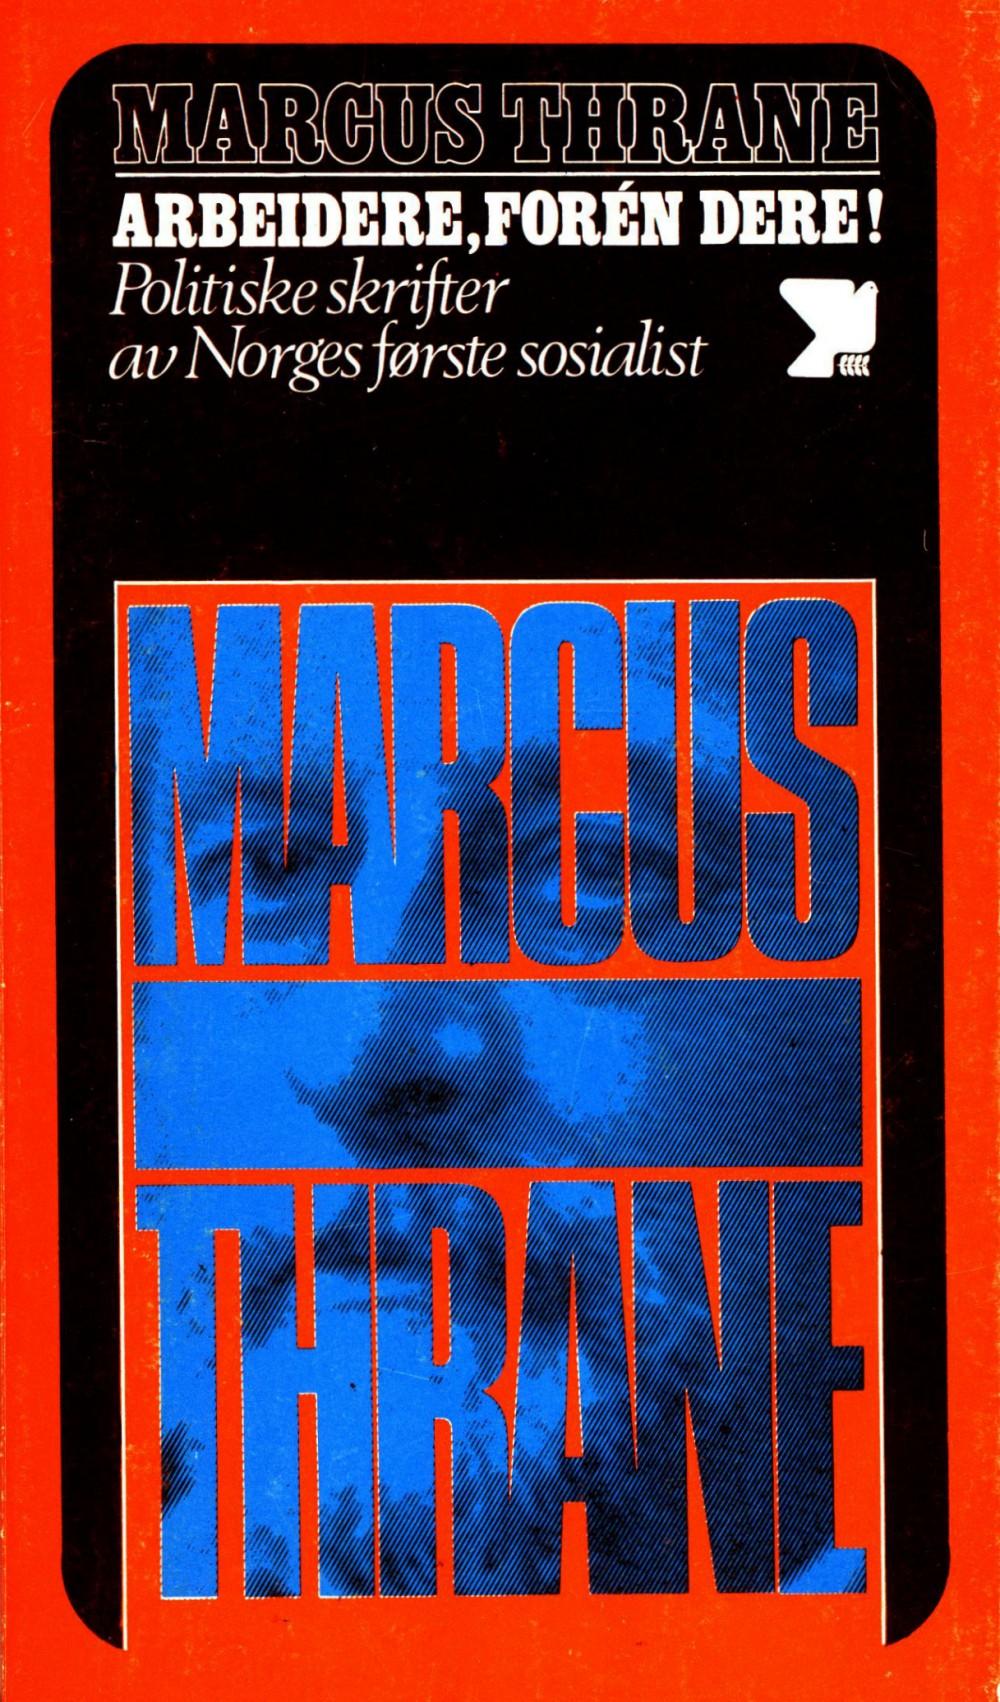 Marcus Thrane: Arbeidere forén dere - Politiske skrifter fra Norges første sosialist